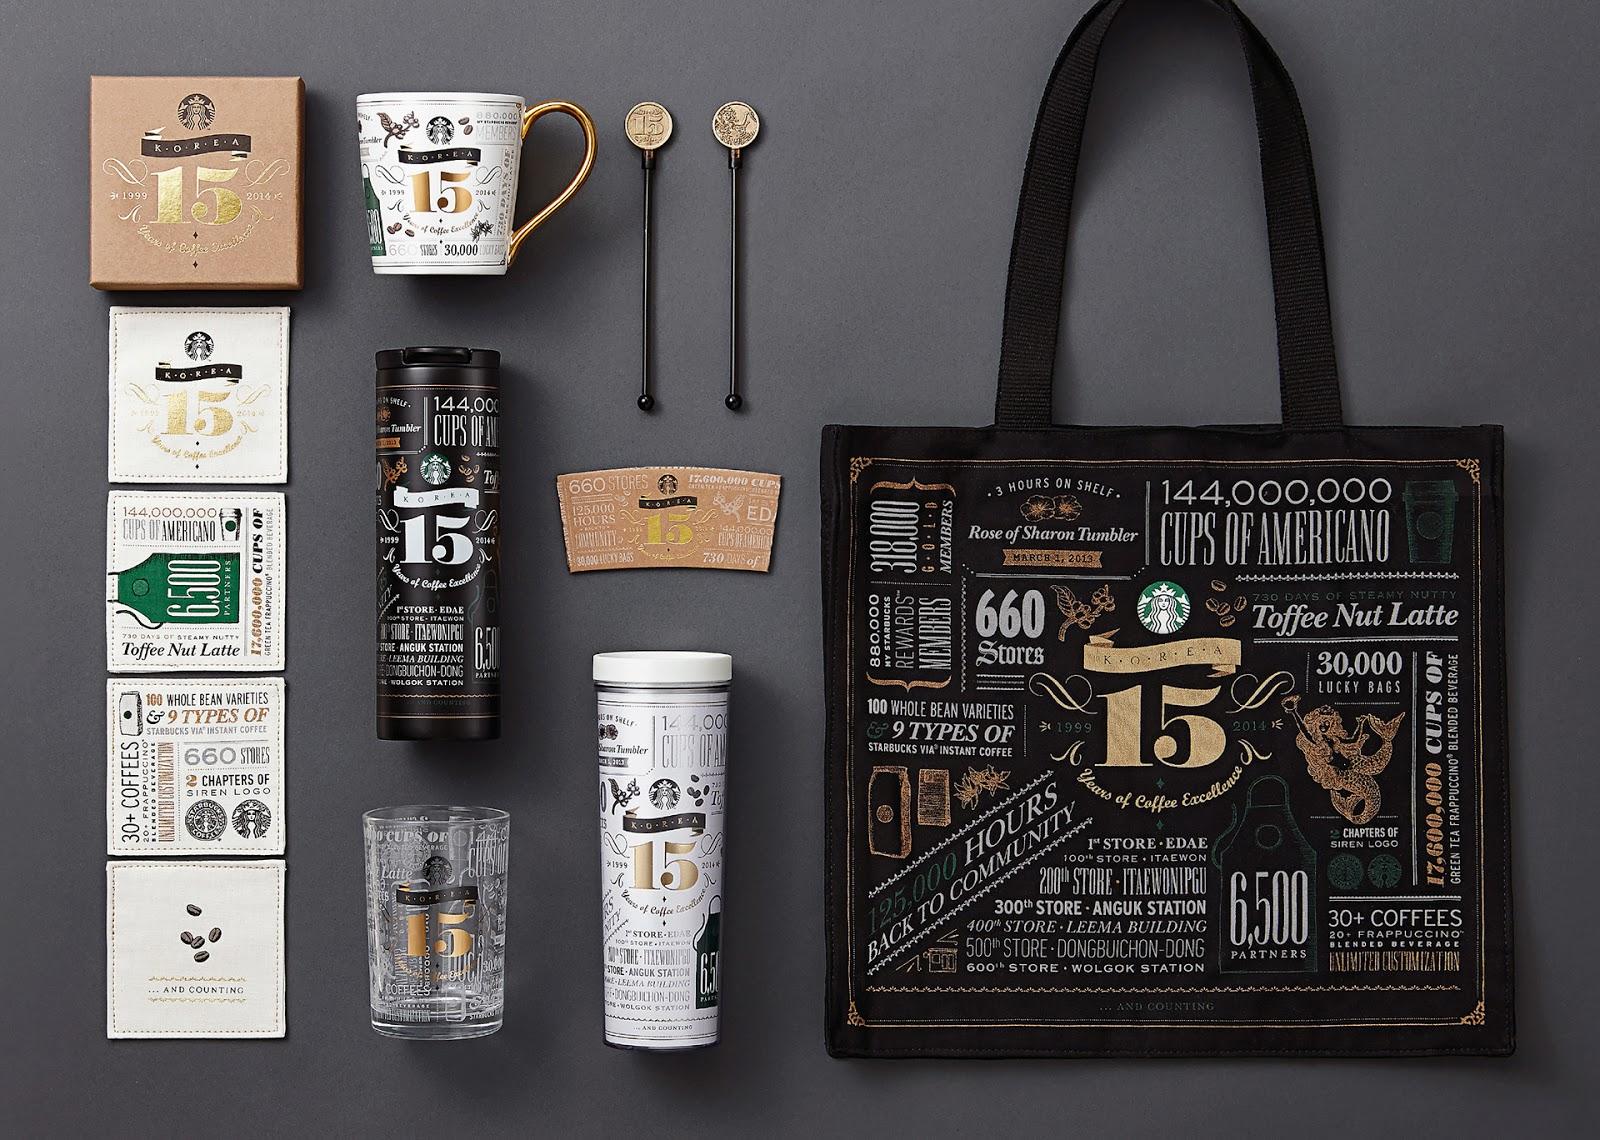 15 Years of Coffee Excellence, Starbucks Korea on ...